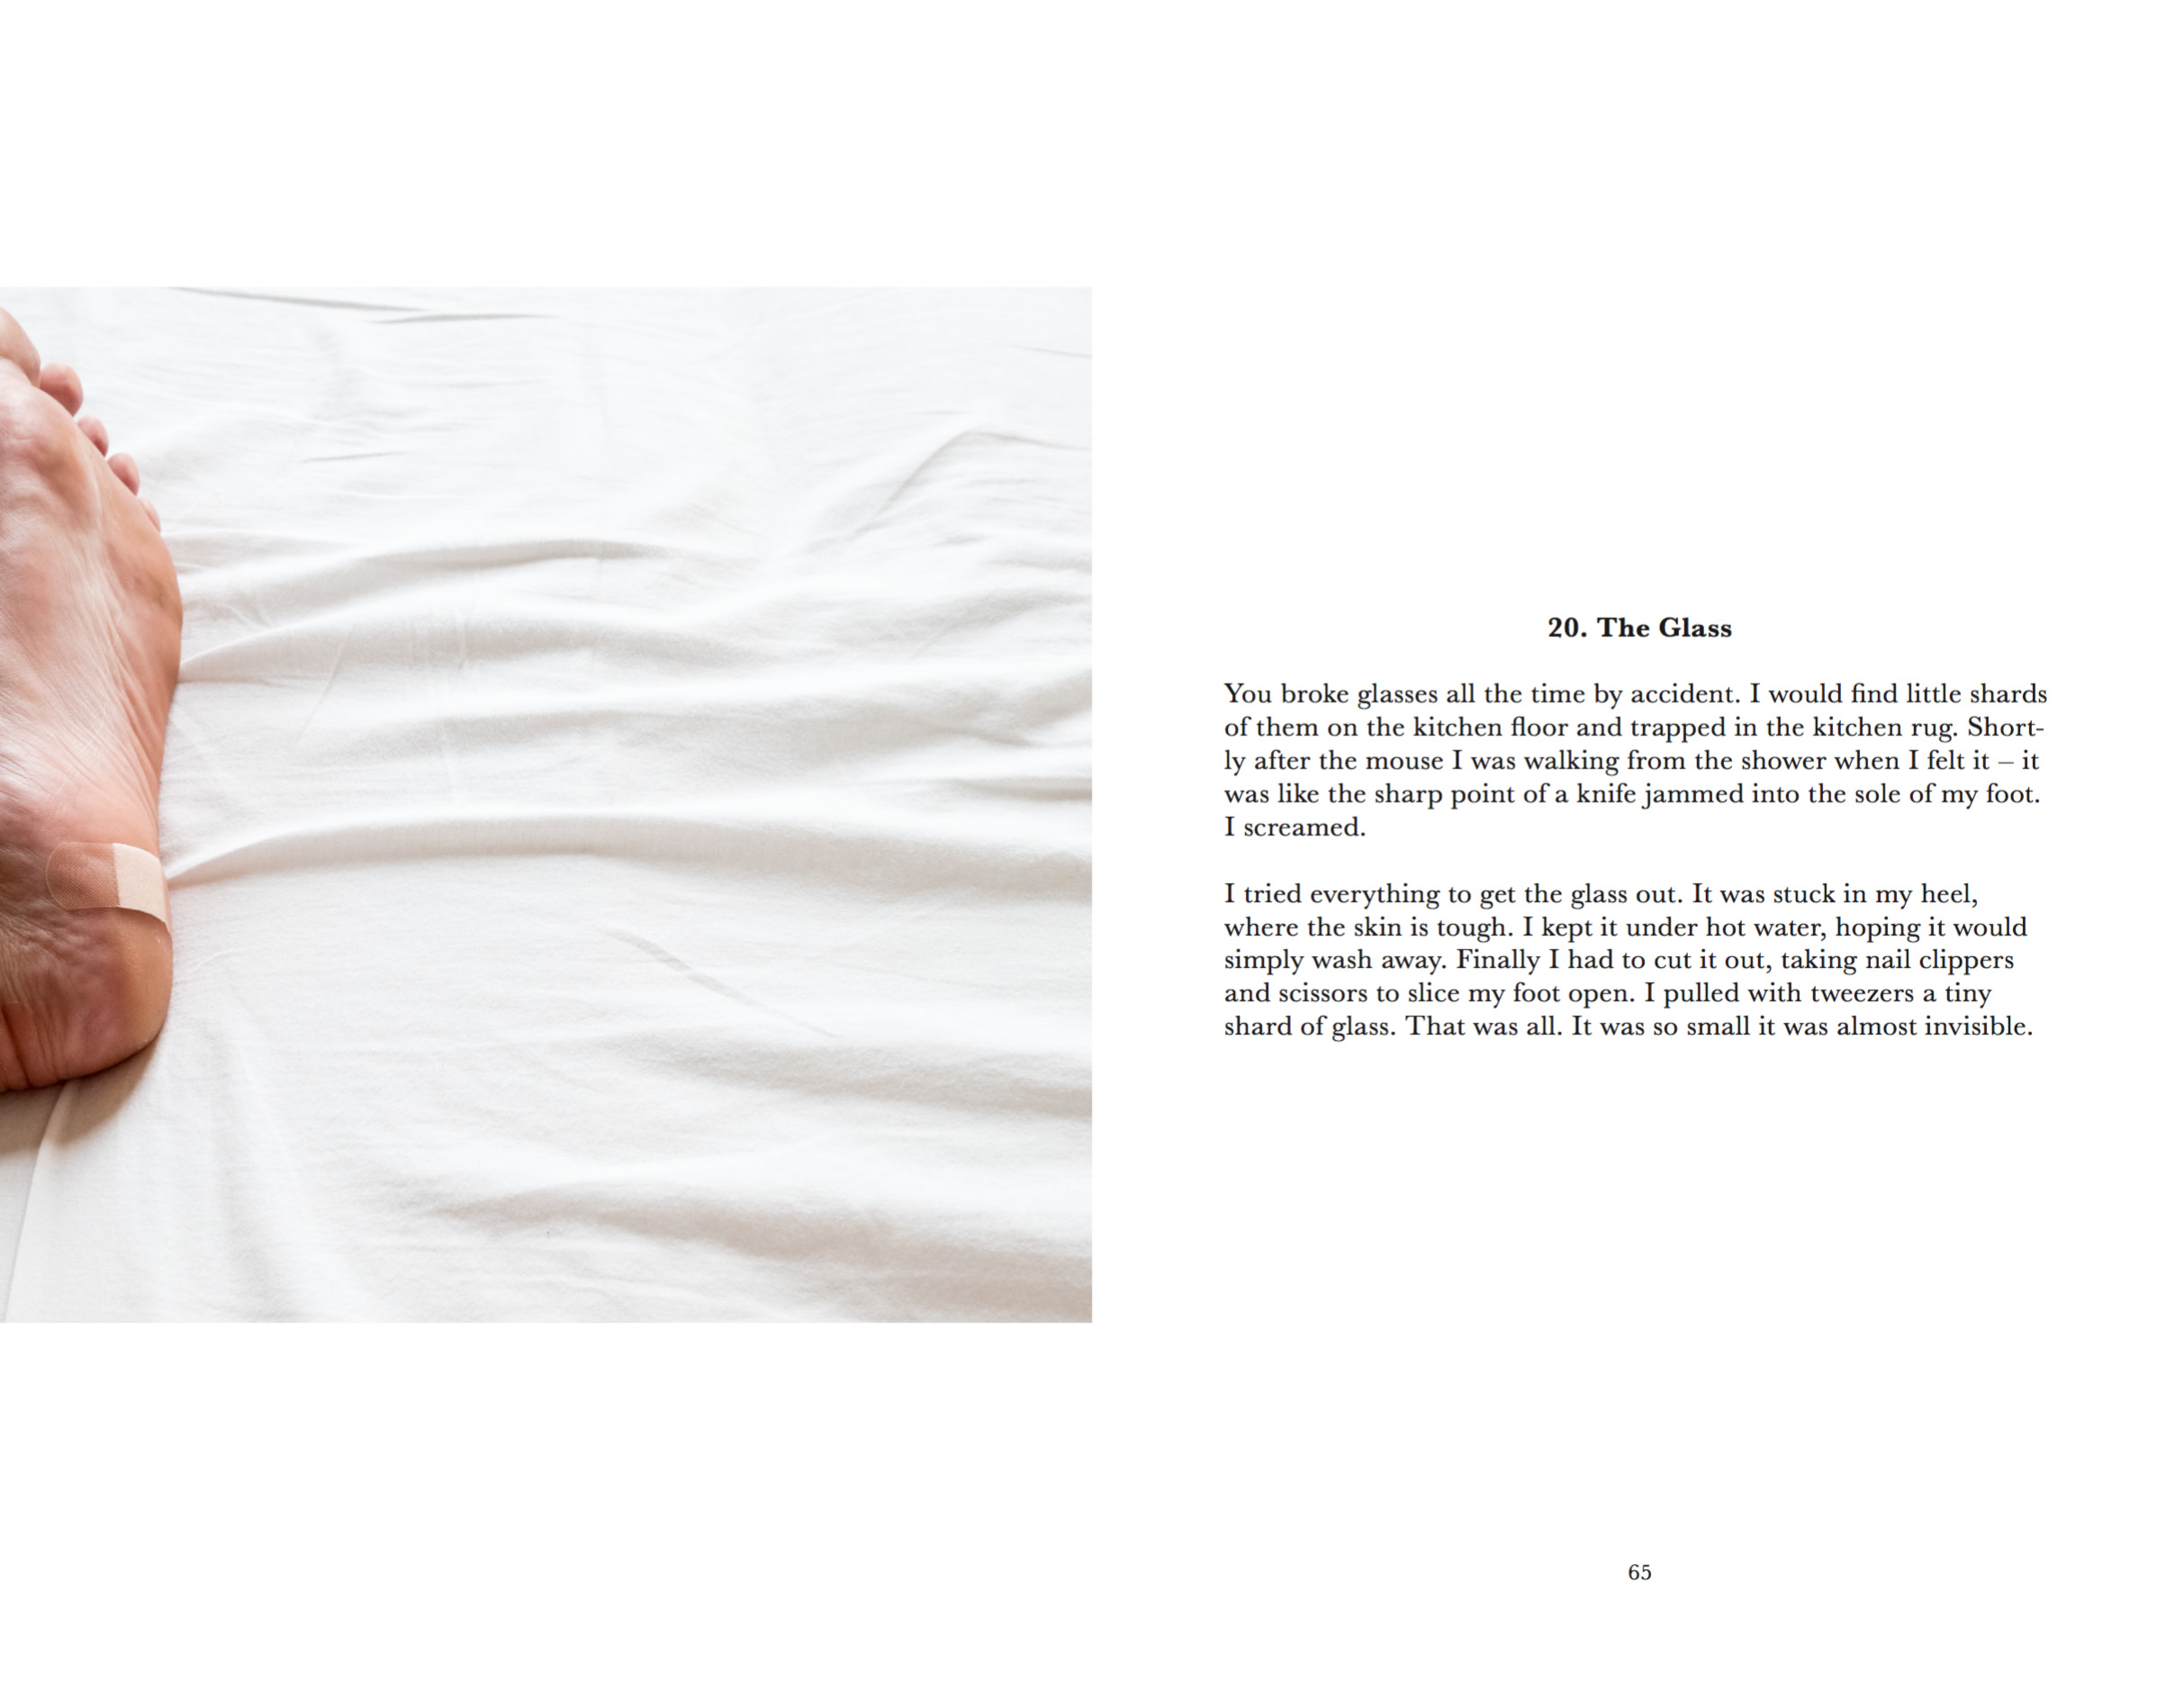 coupling book photos 7.jpg